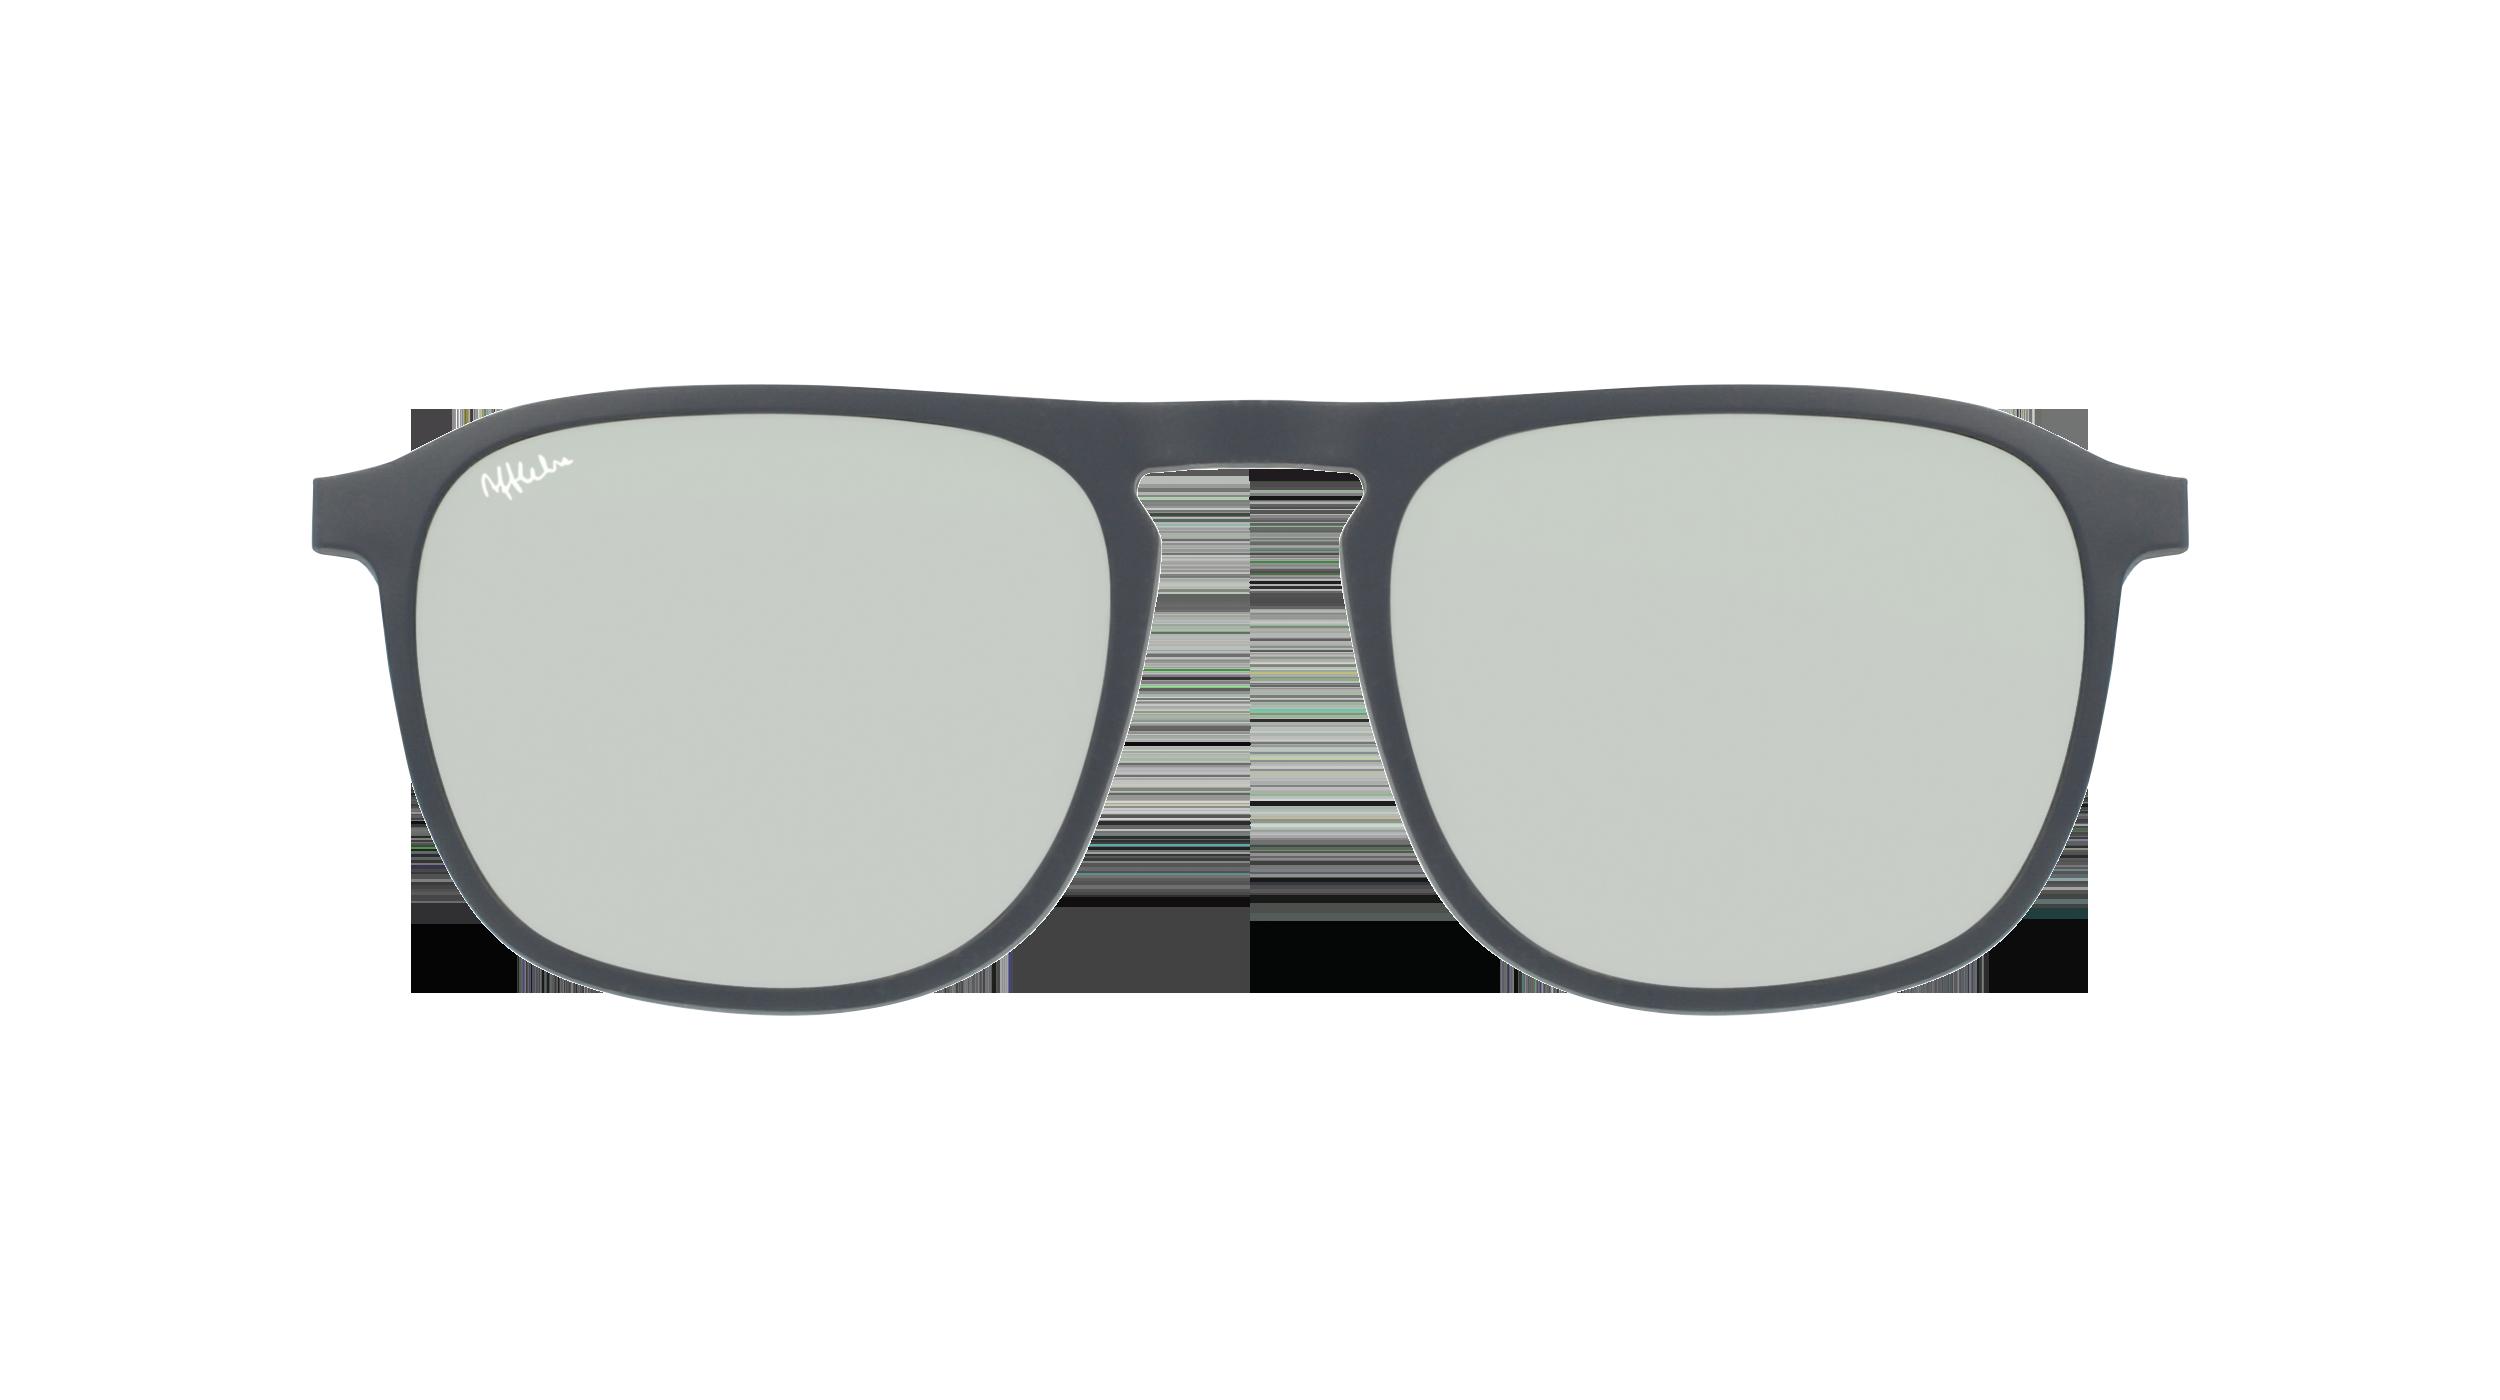 afflelou/france/products/smart_clip/clips_glasses/07630036457290.png